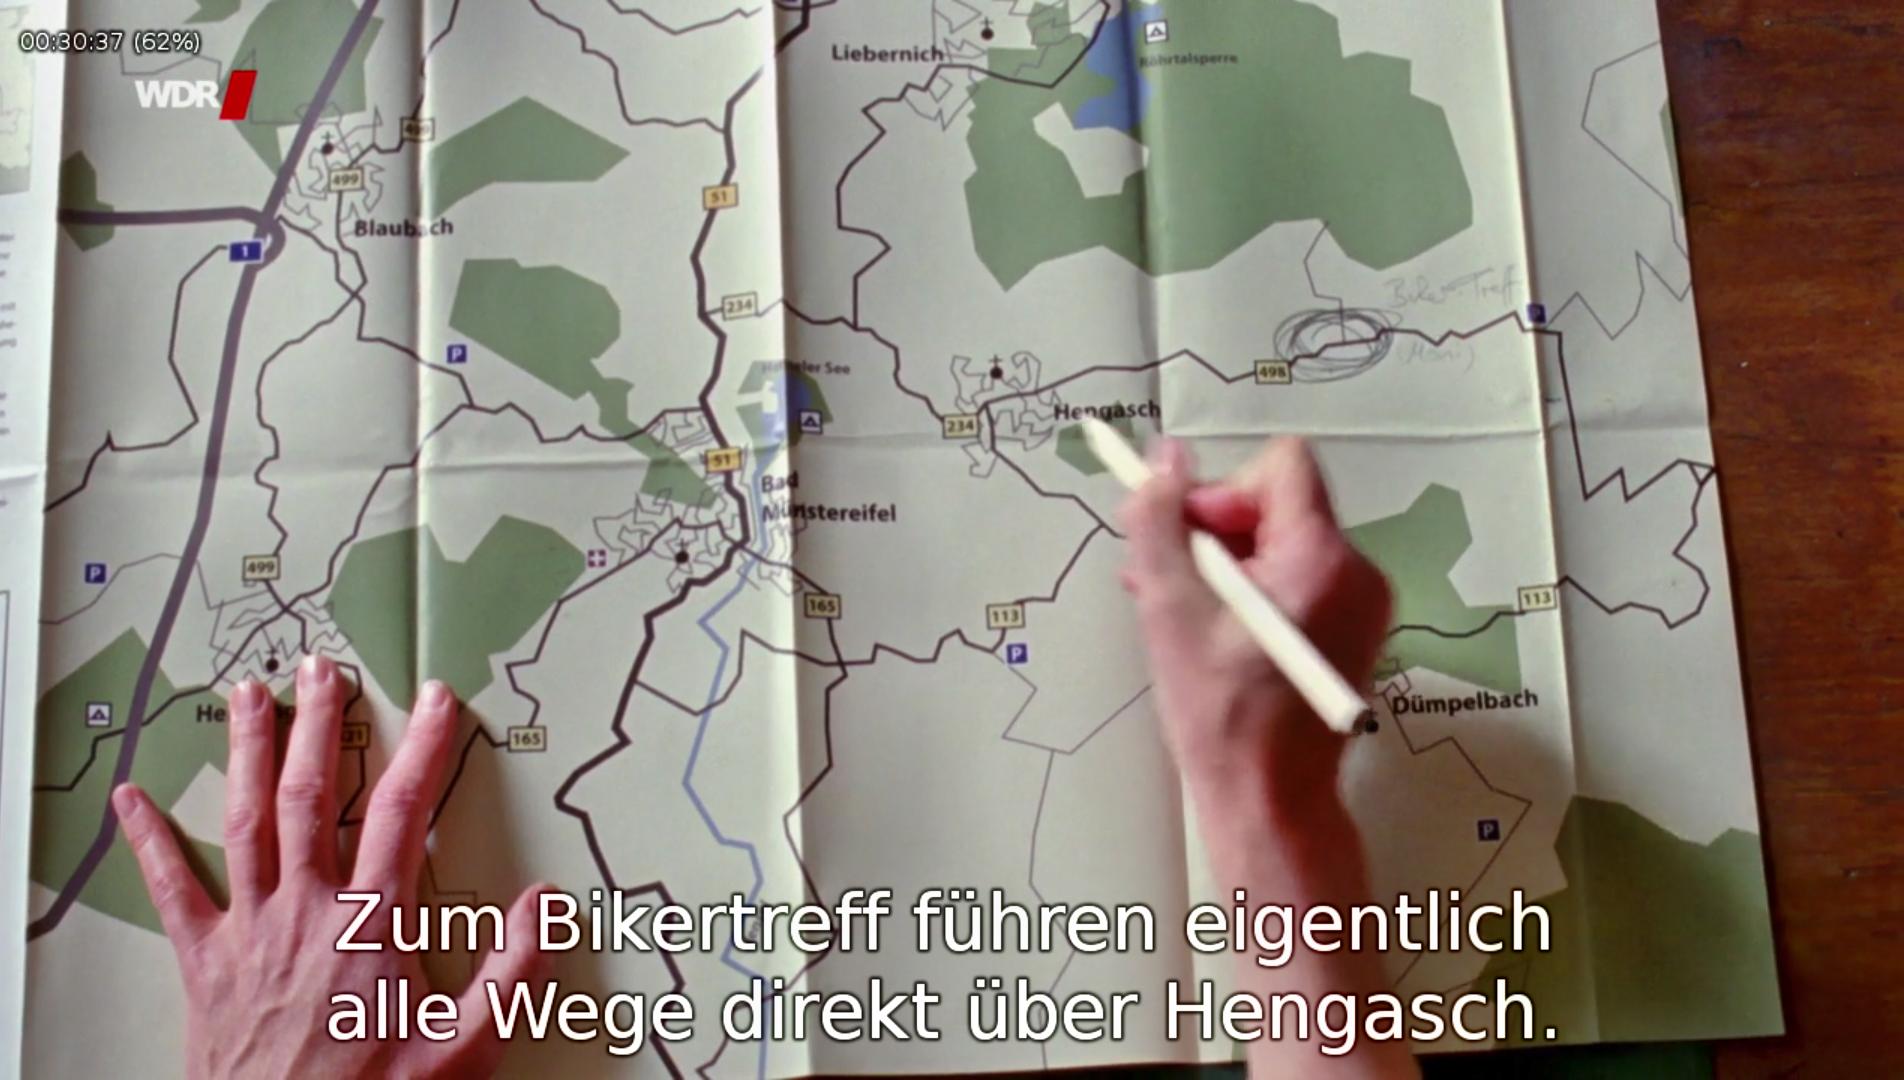 Hengasch.png